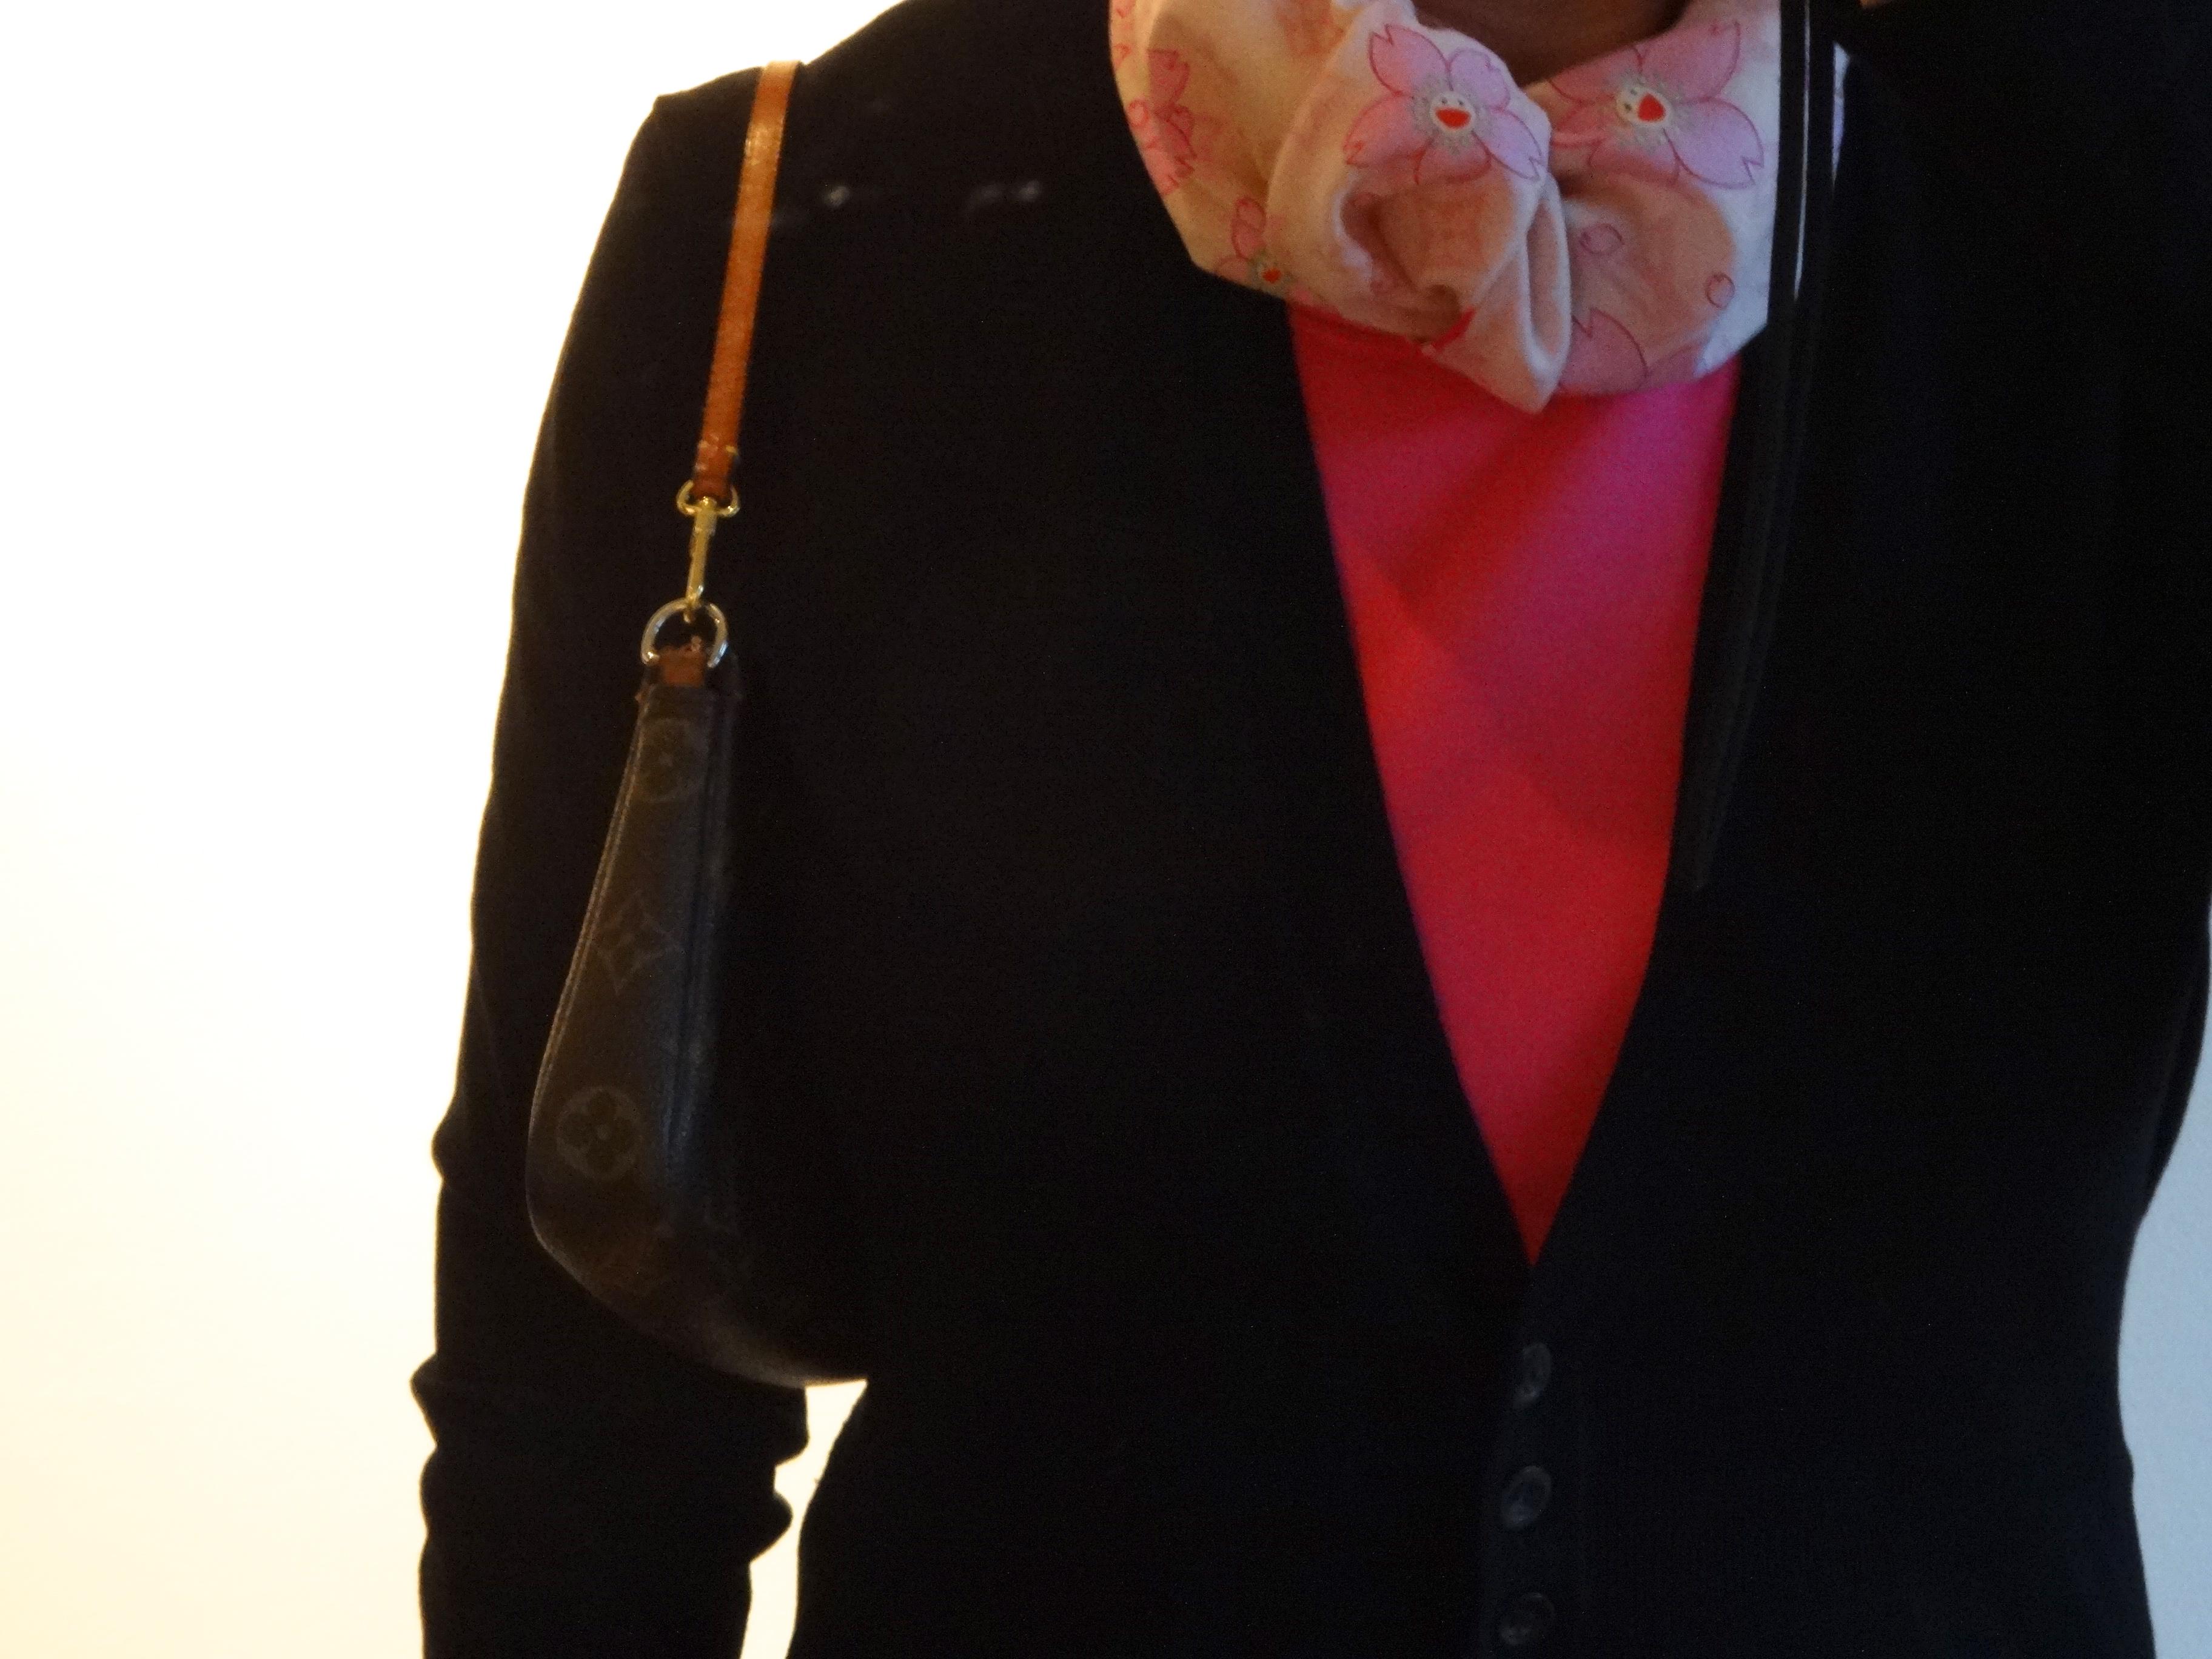 Pochette Accessoires - on regular strap / regulärer Schulterriemen